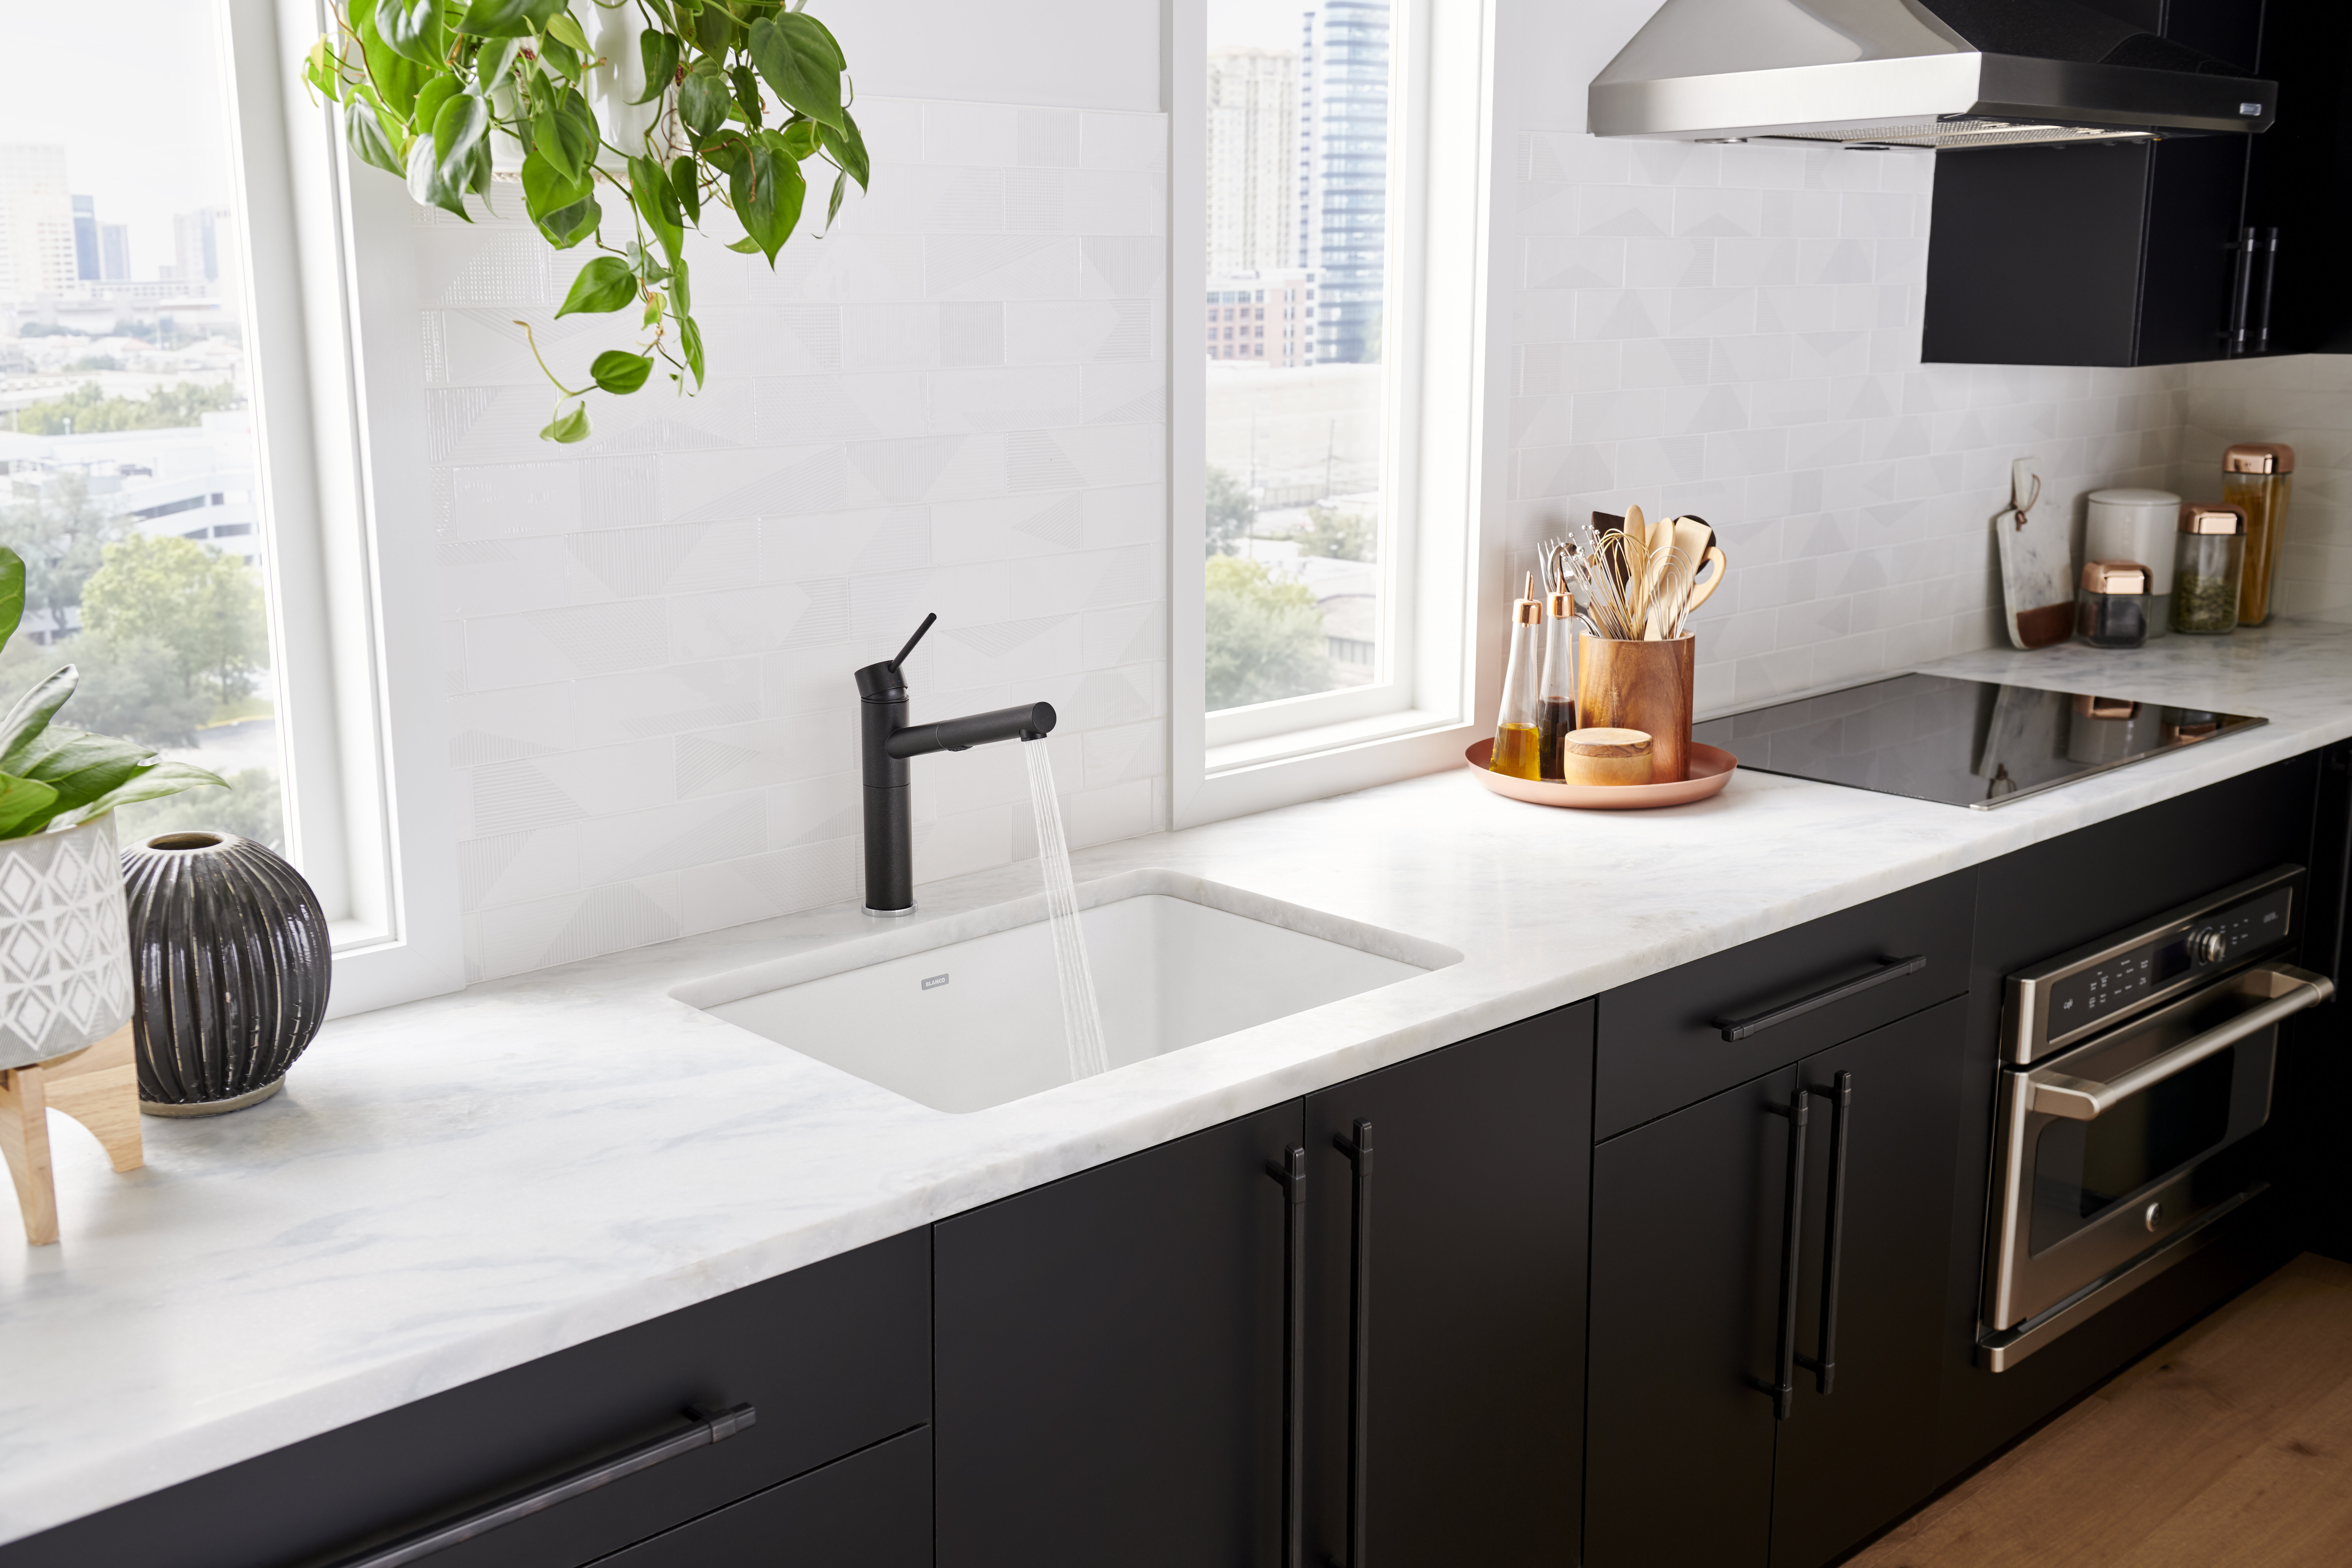 Blanco Precis Silgranit 27 L X 18 W Undermount Kitchen Sink Reviews Wayfair